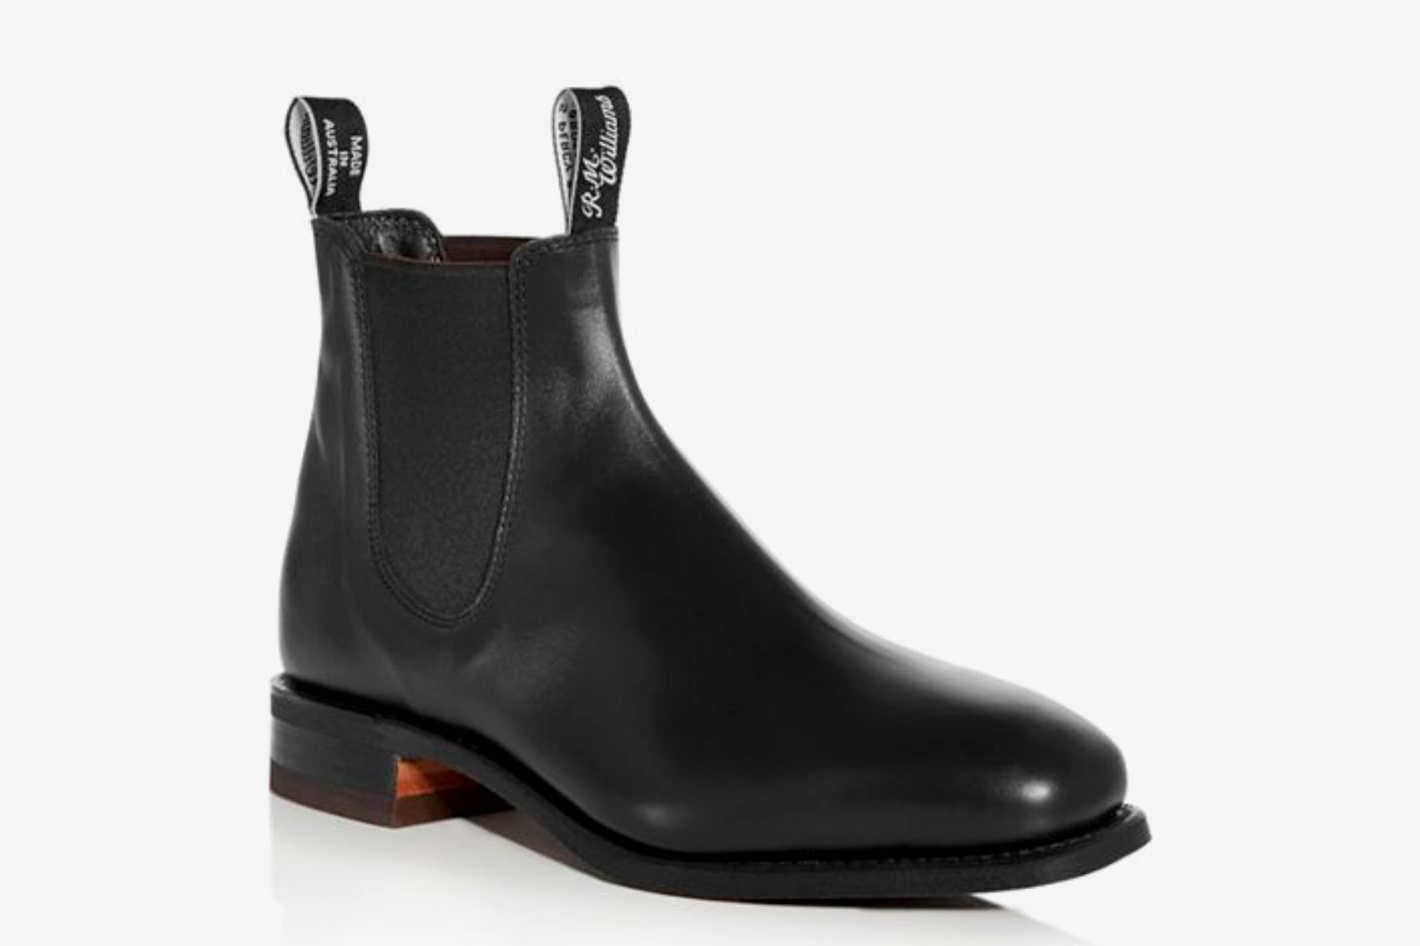 R.M. Williams Men's Comfort Craft Leather Chelsea Boots